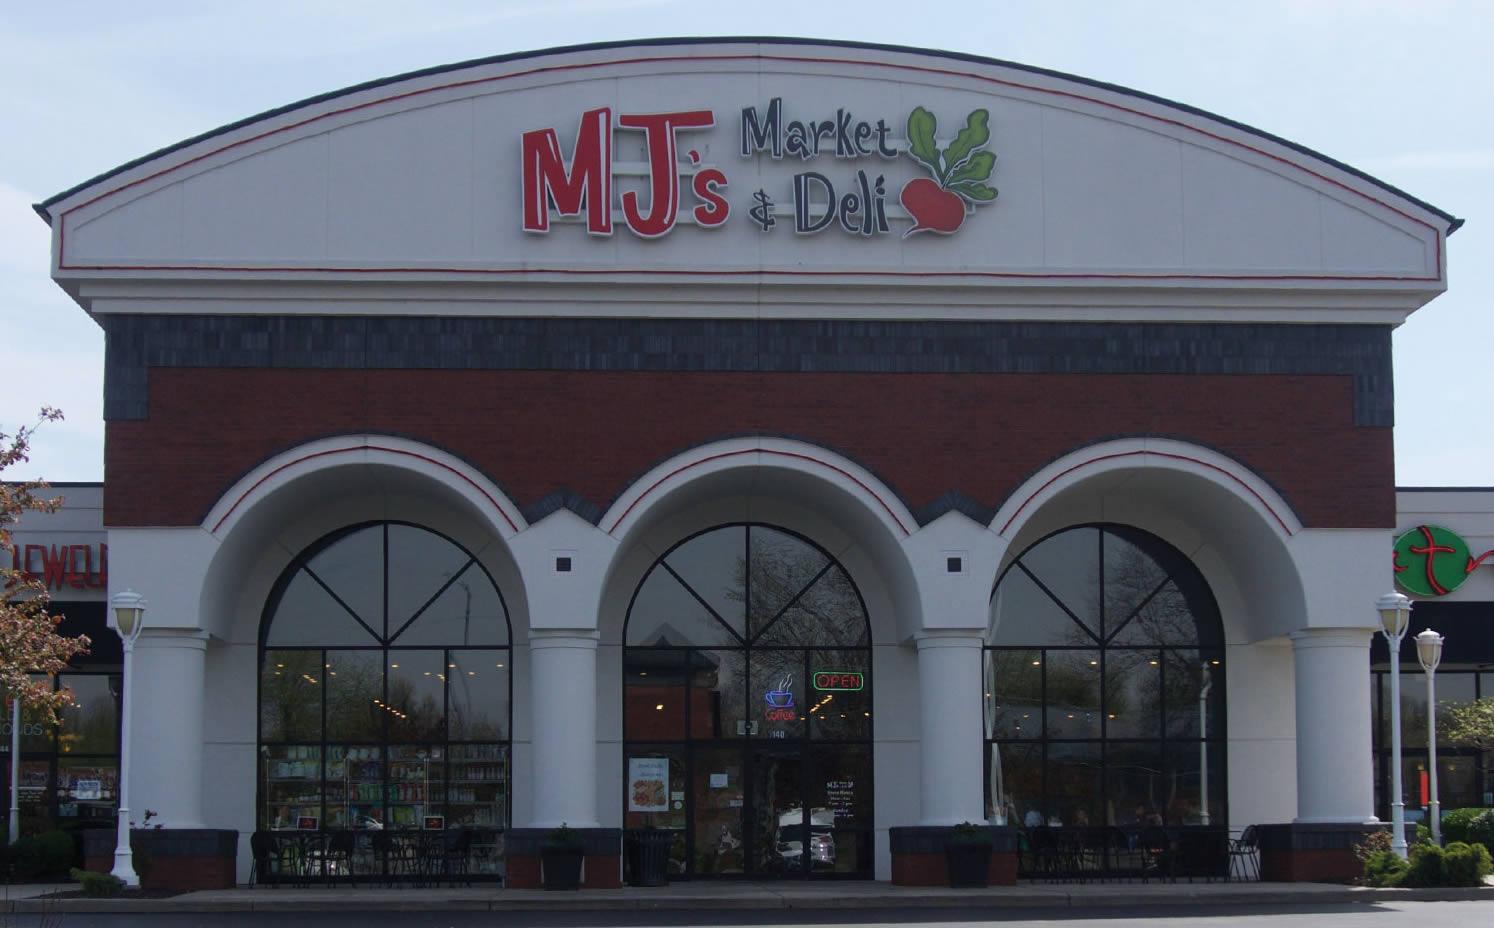 MJ's Market & Deli